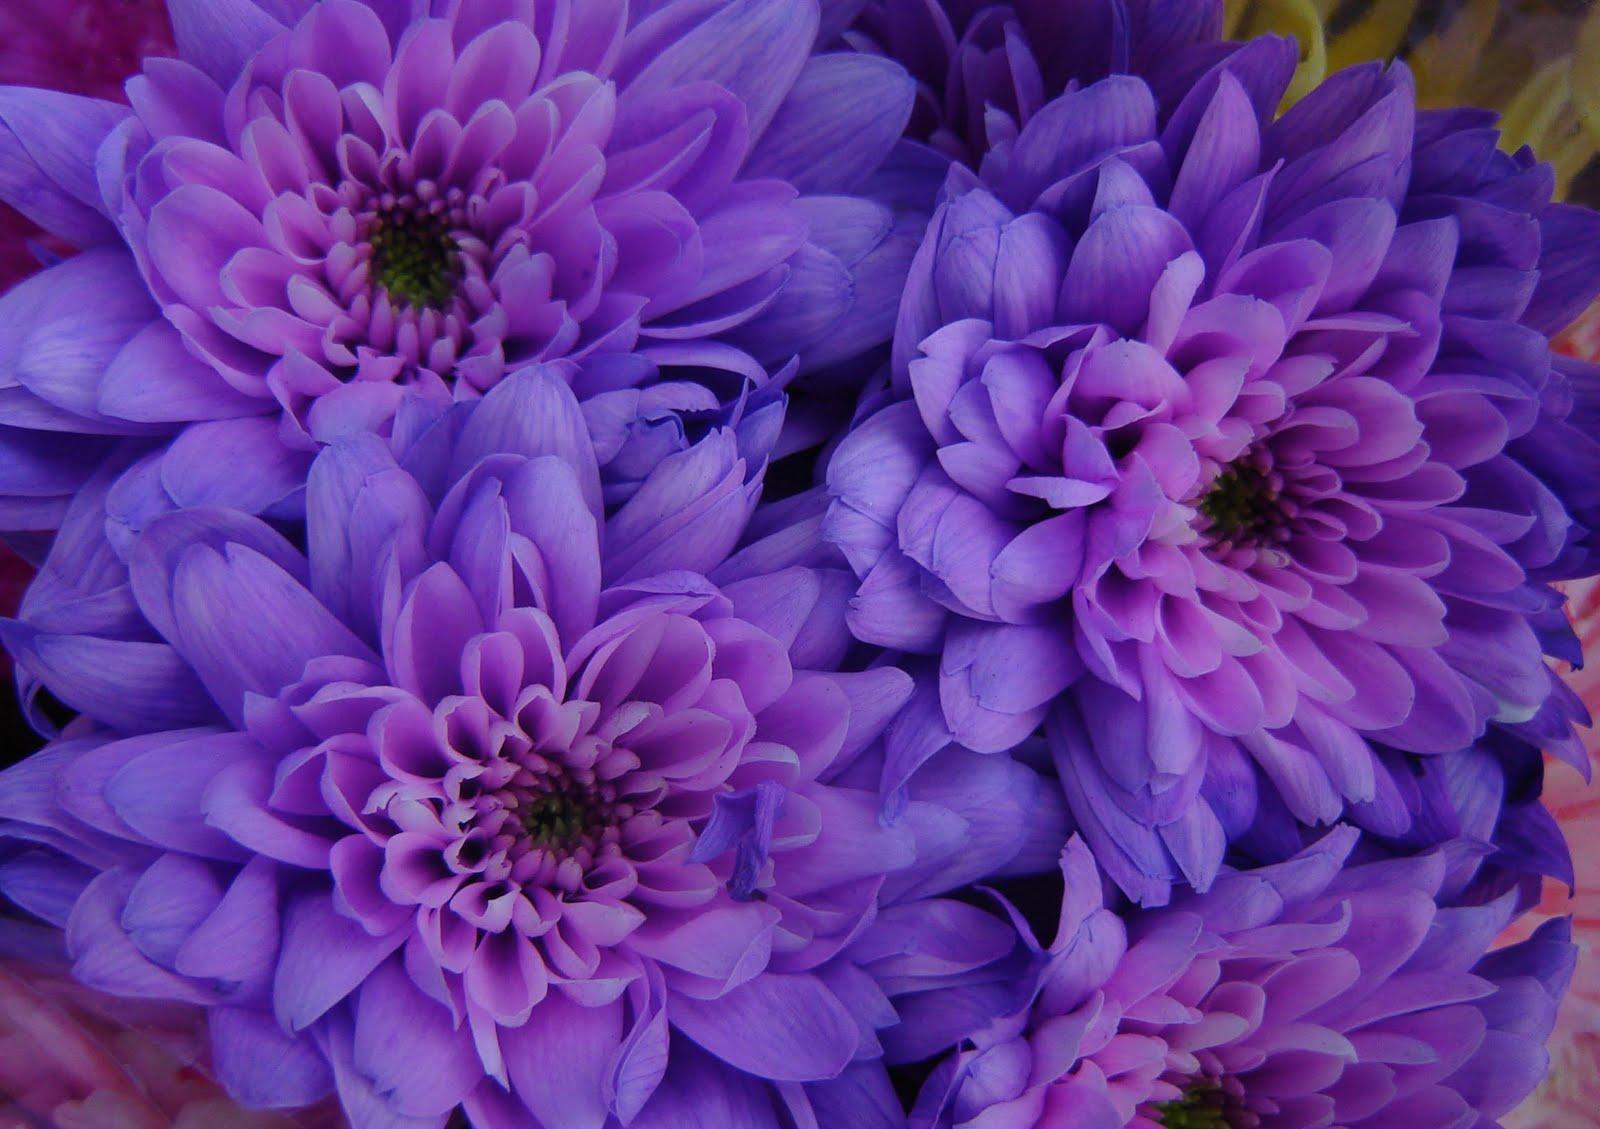 July Birthday Flower Choice Image Flower Wallpaper Hd